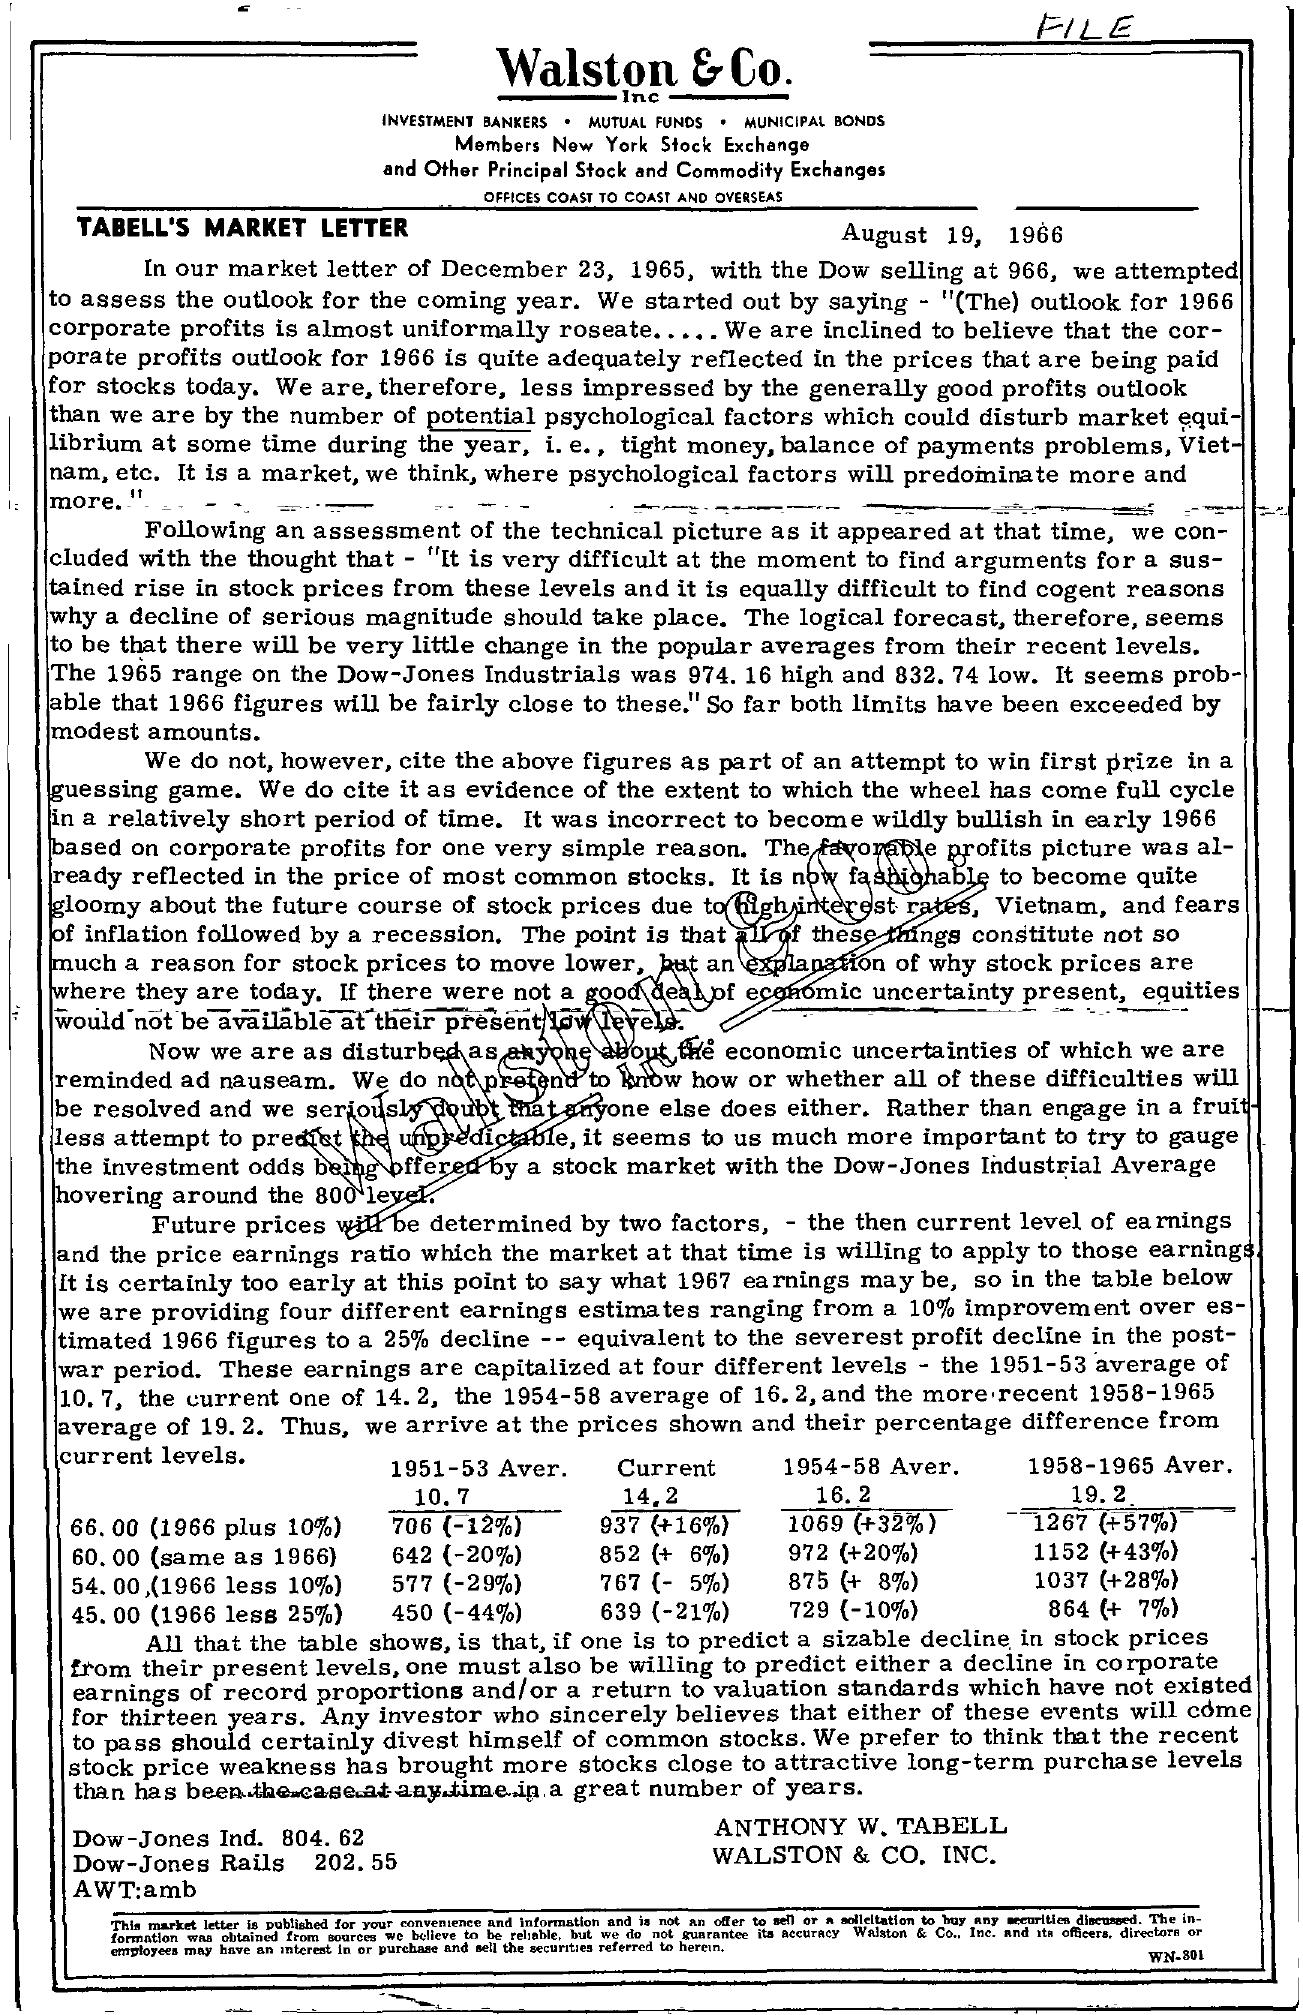 Tabell's Market Letter - August 19, 1966